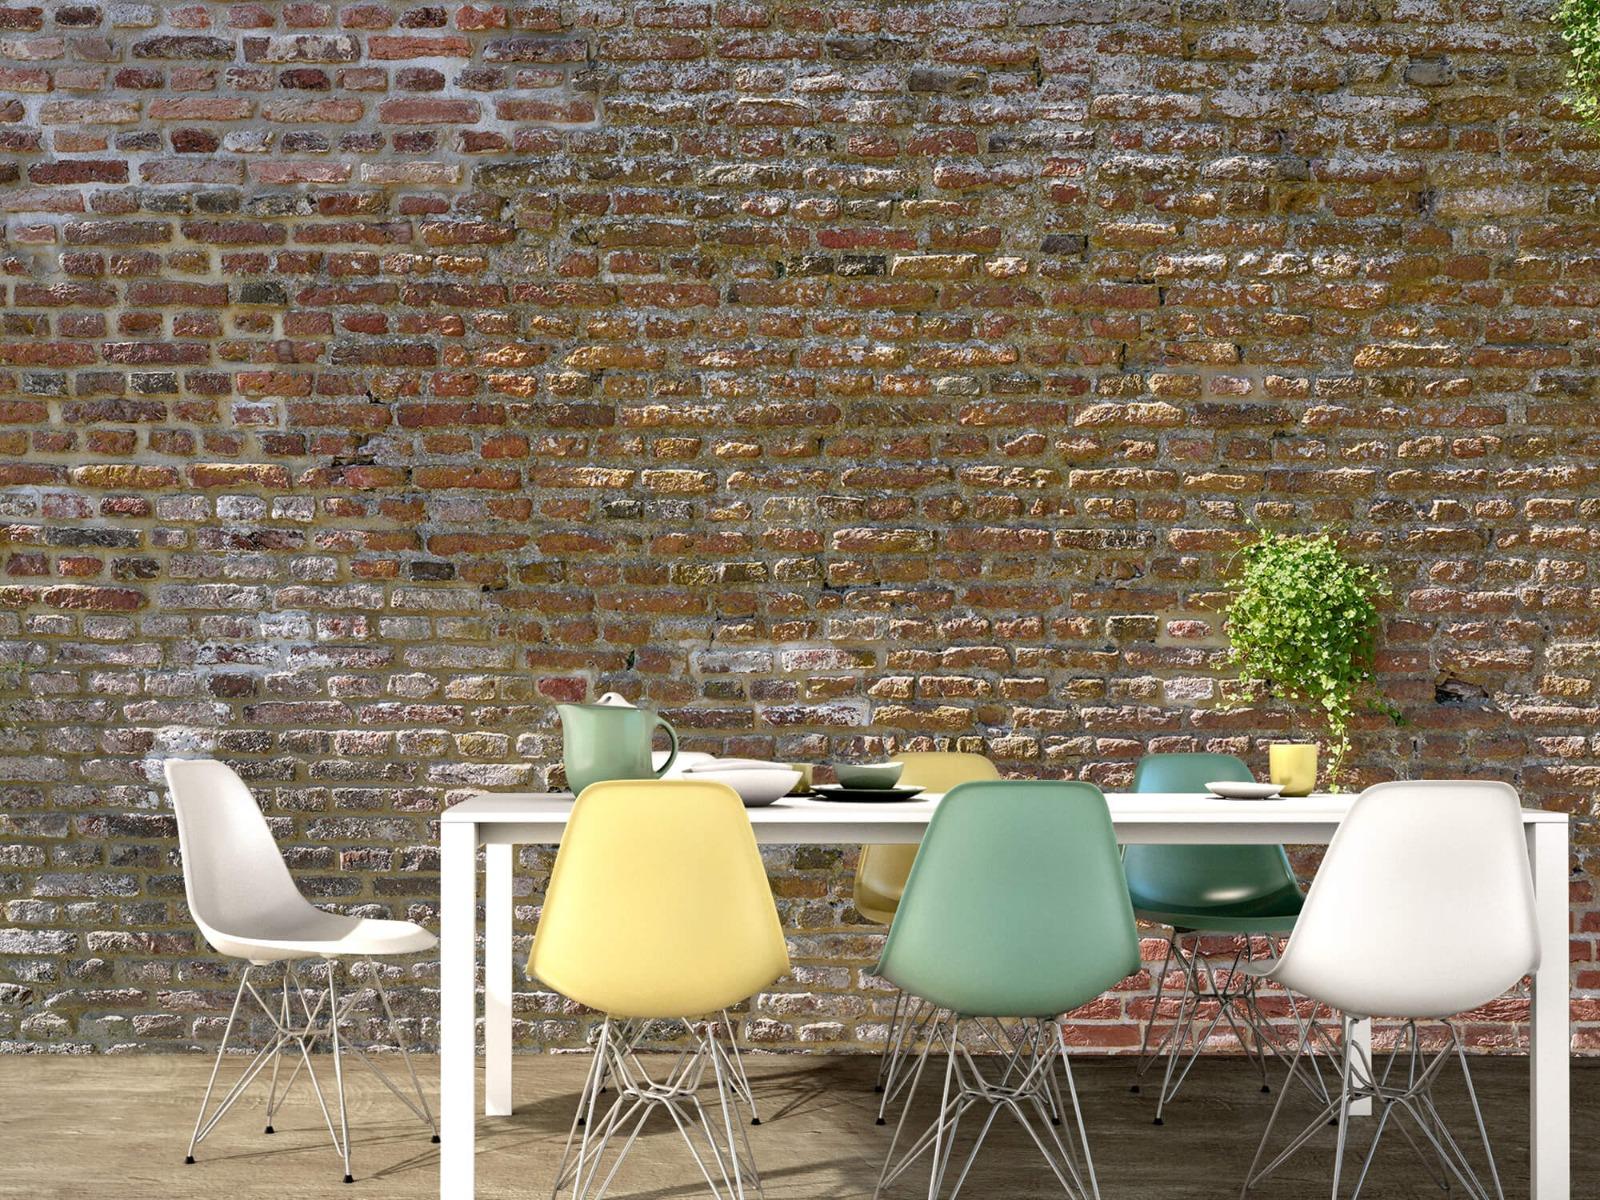 Stenen - Oude stenen stadsmuur met plantjes 15